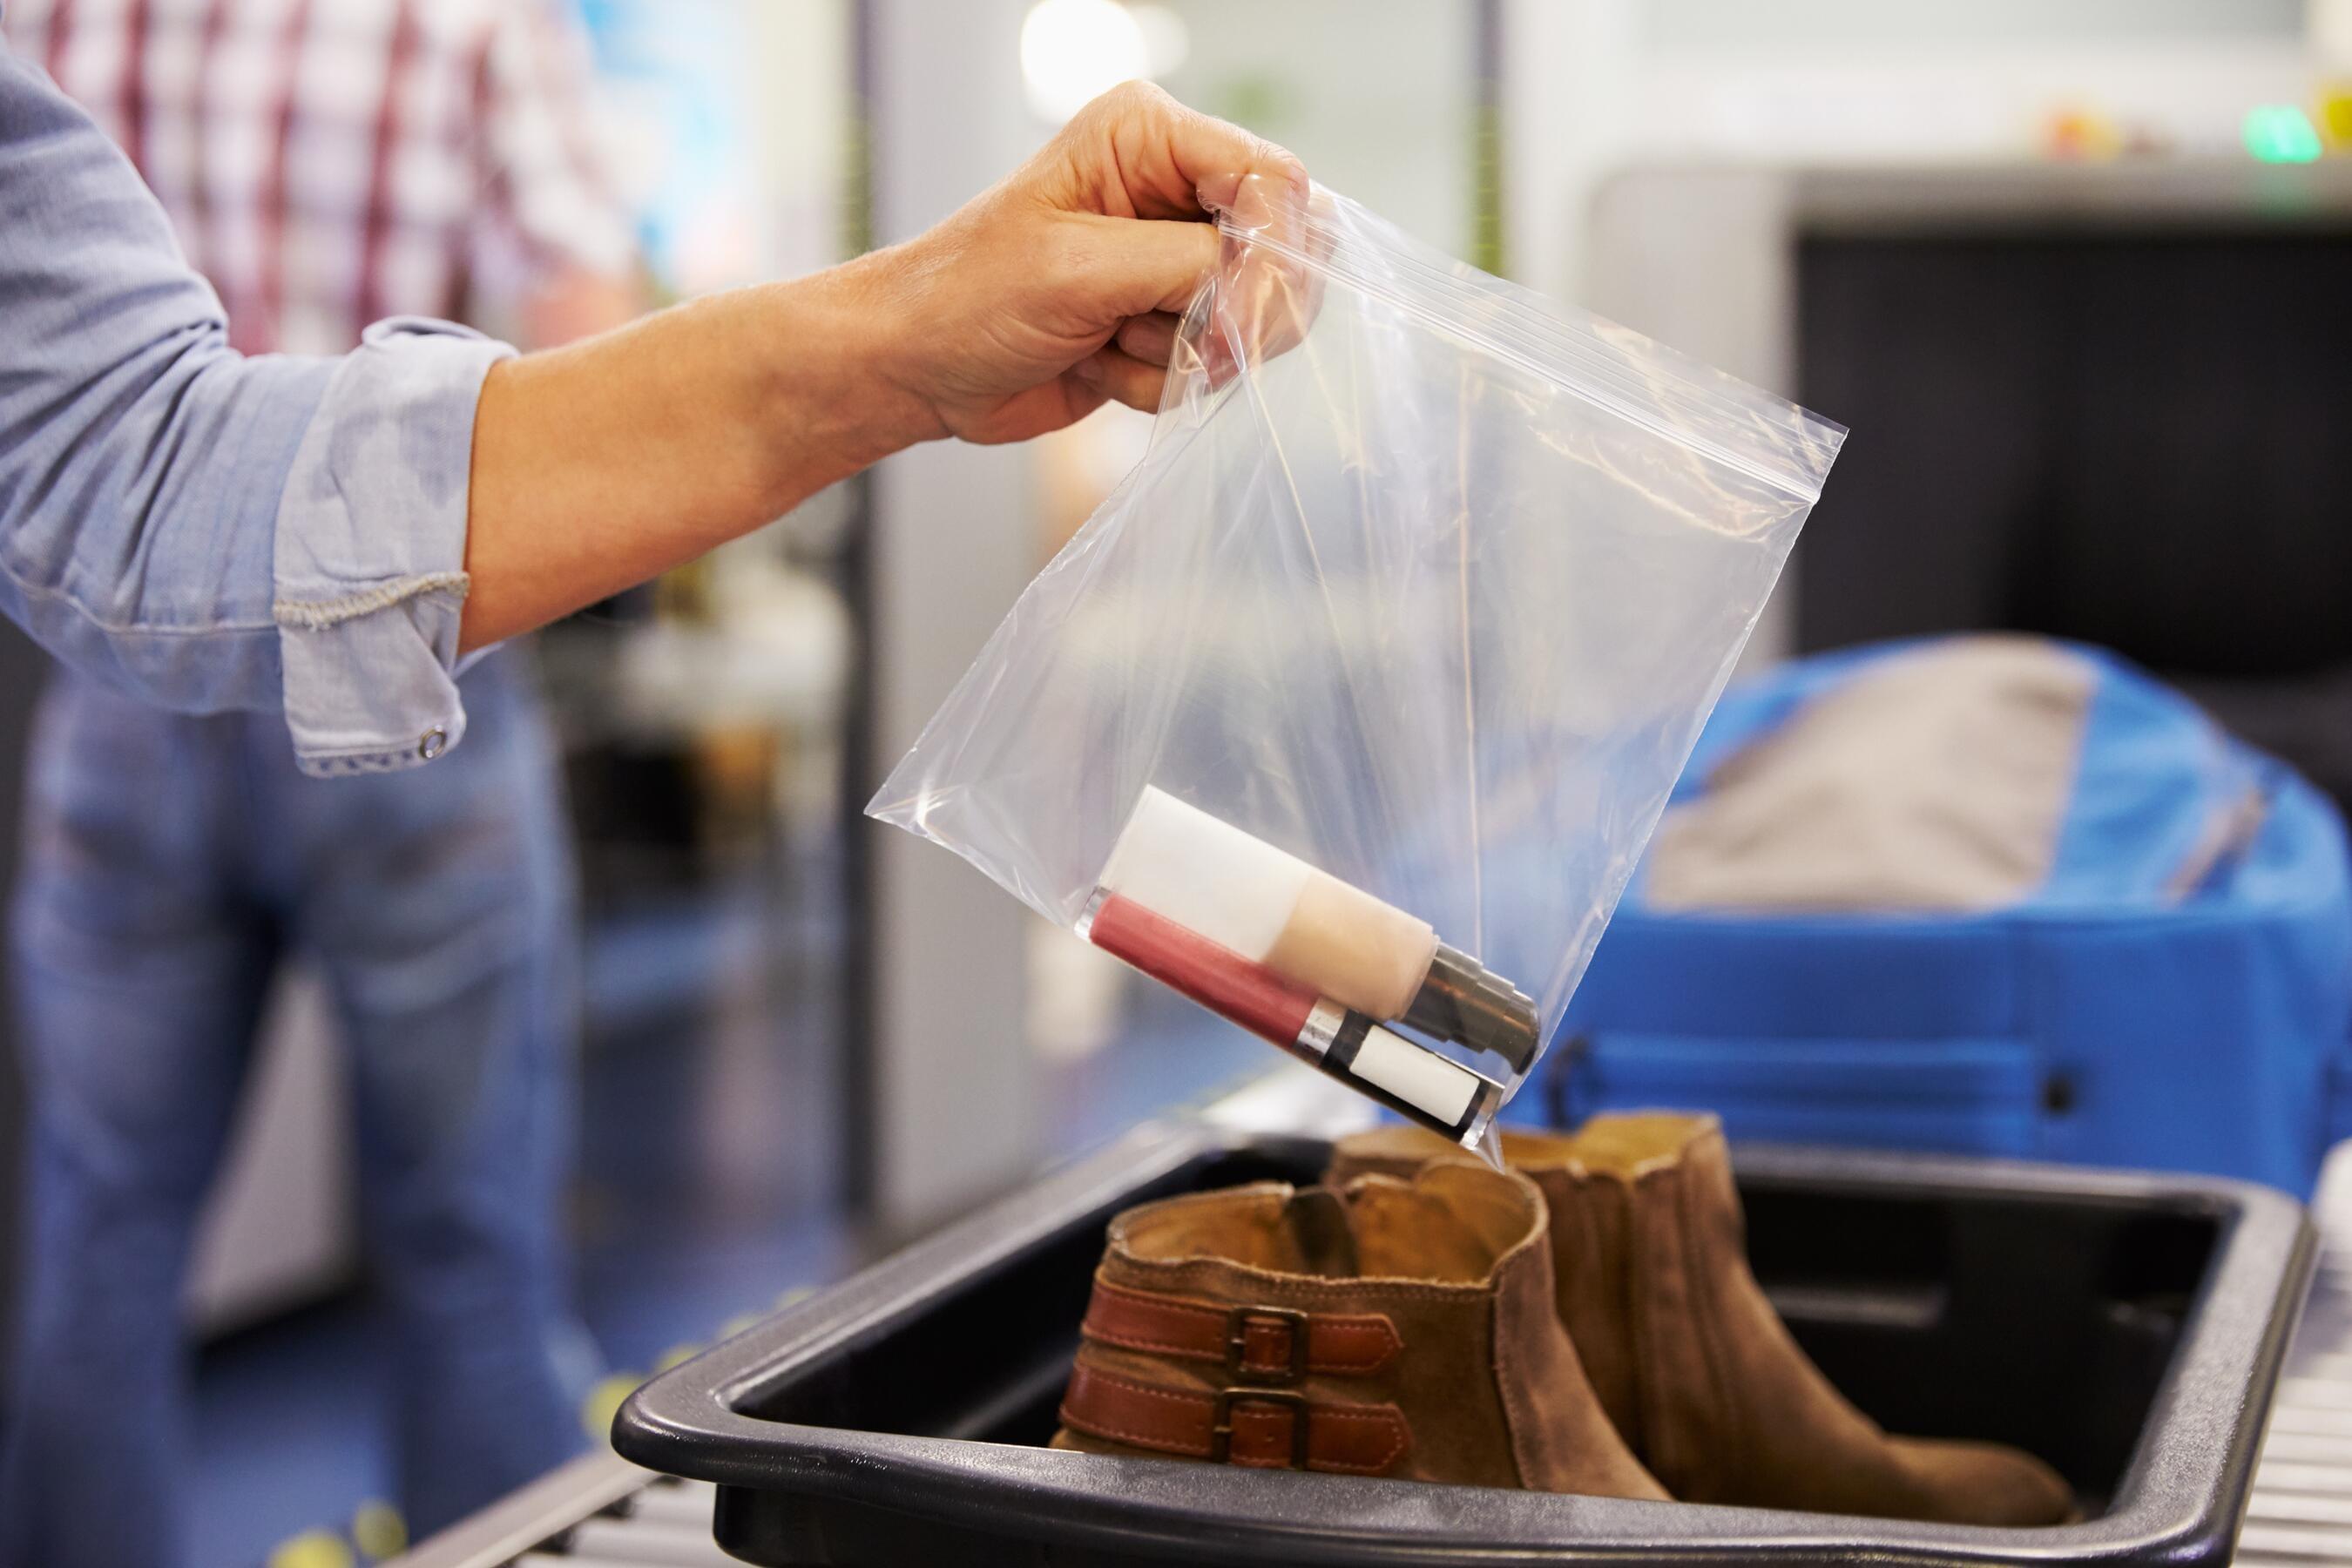 How to Pack Liquids Using the TSA's 3-1-1 Rule